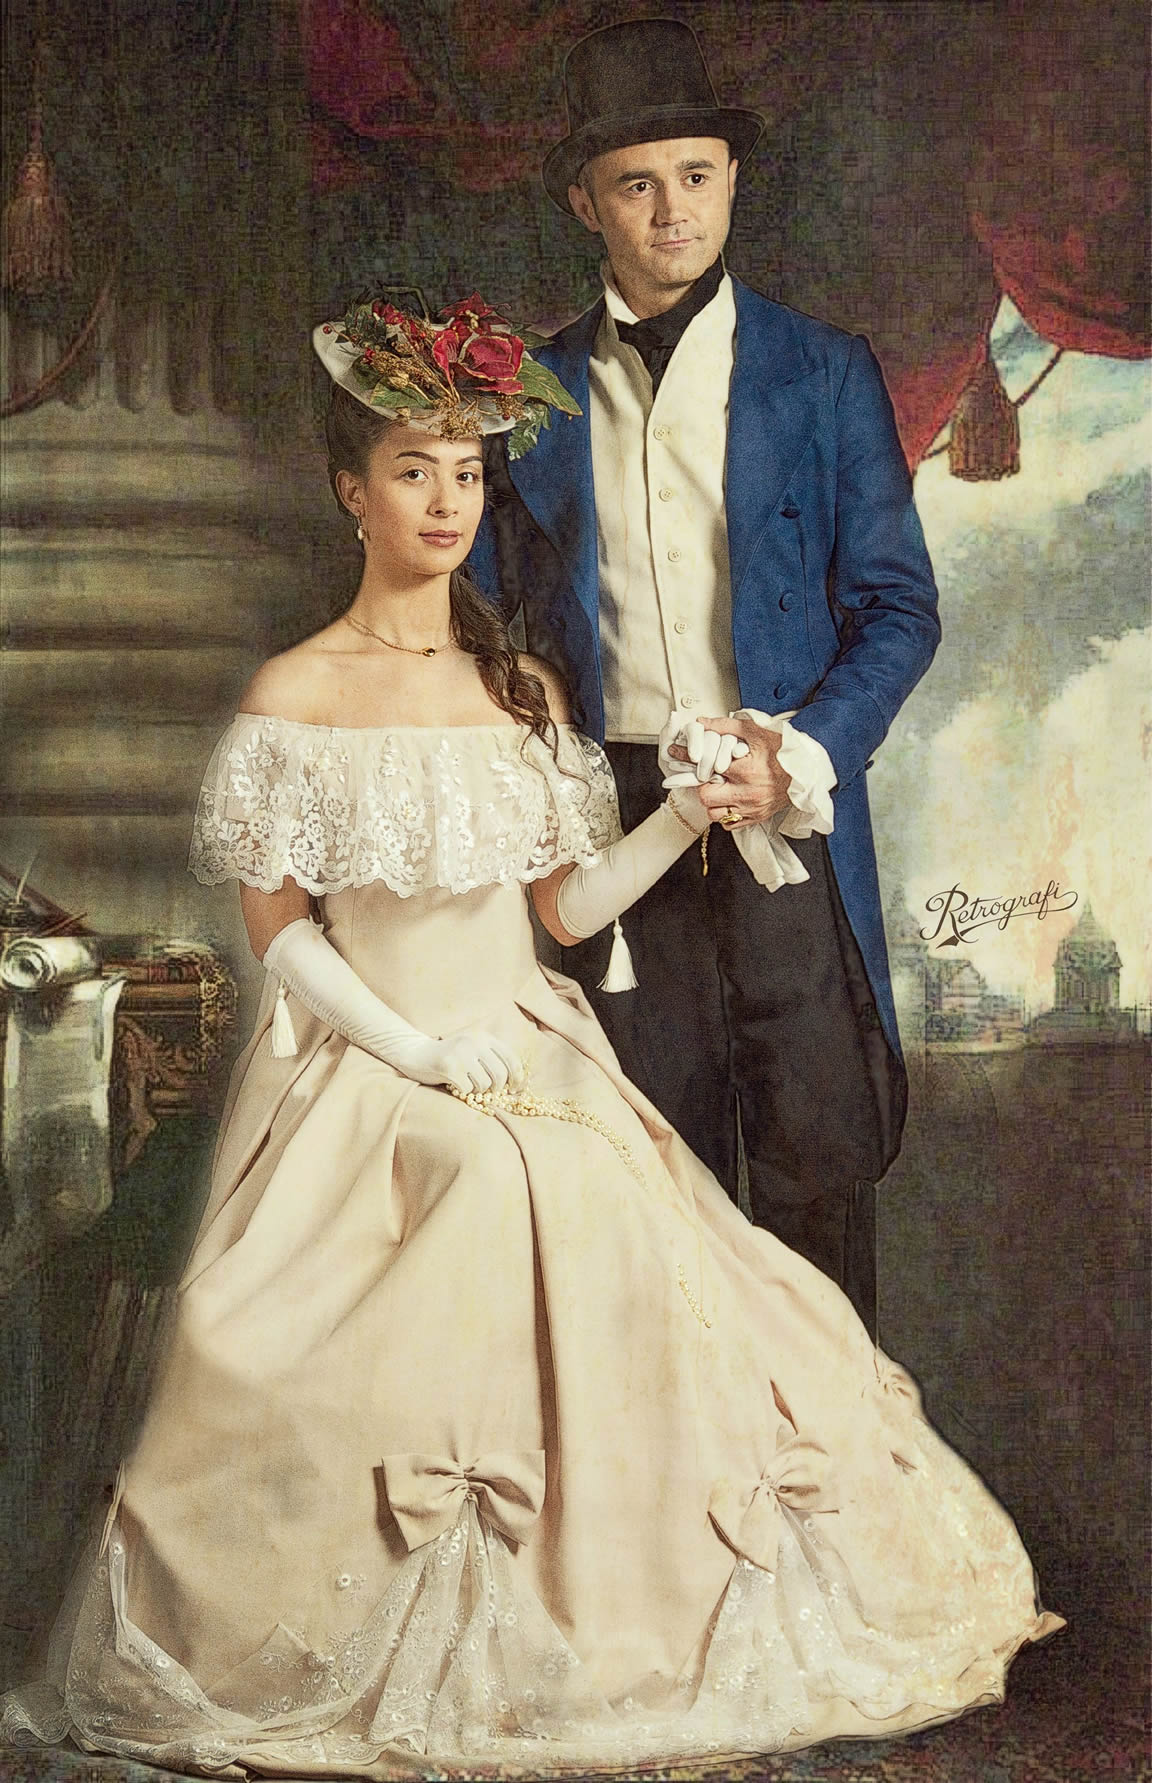 Фотомонтаж портреты аристократов